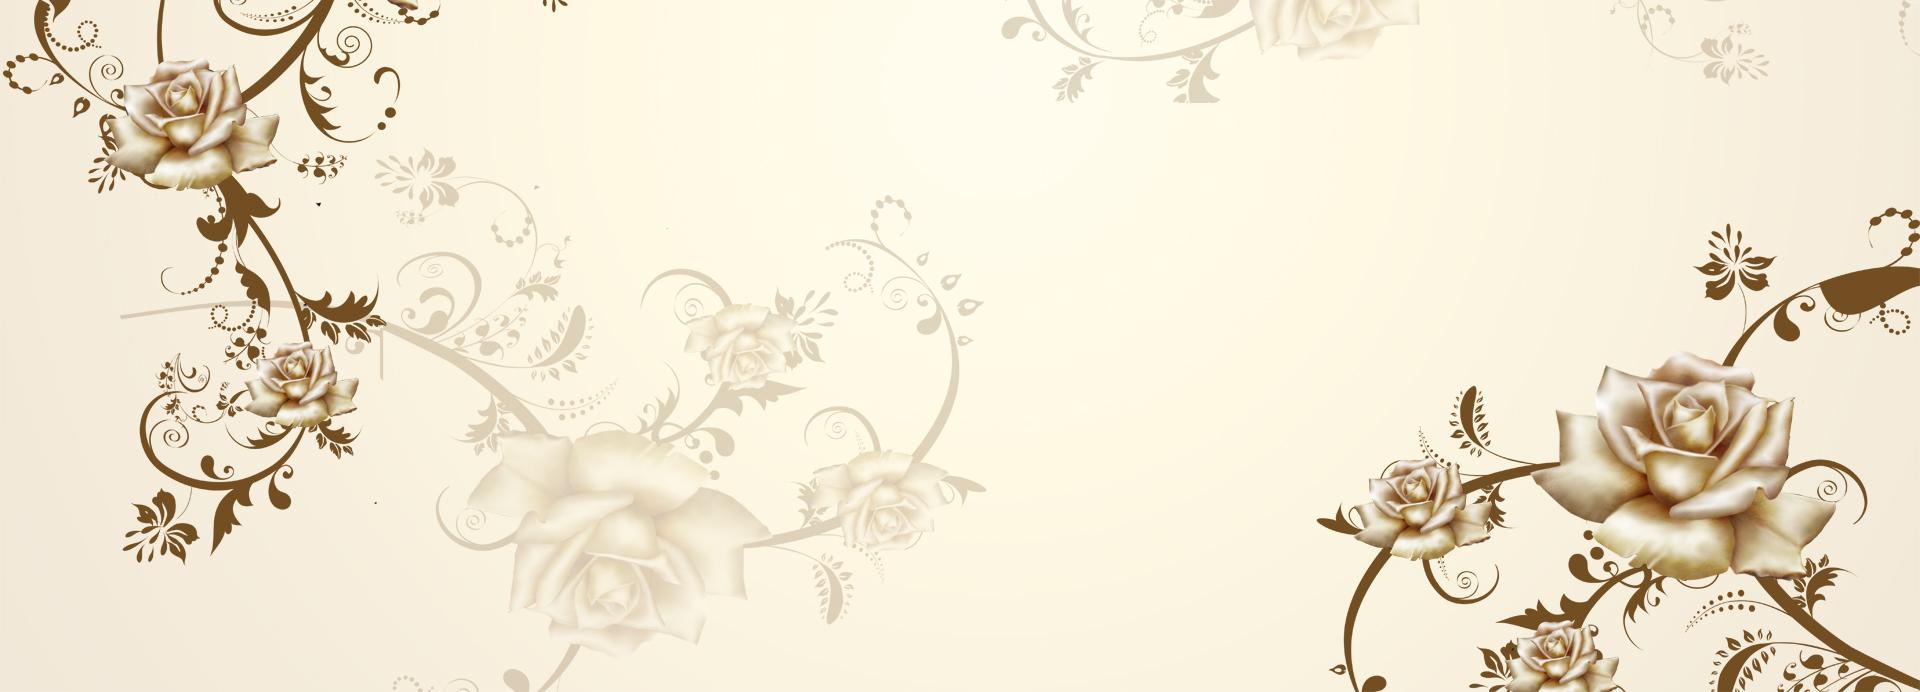 jaune p u00e2le rose simple de fond jaune p u00e2le roses la simplicit u00e9 de fond image de fond pour le